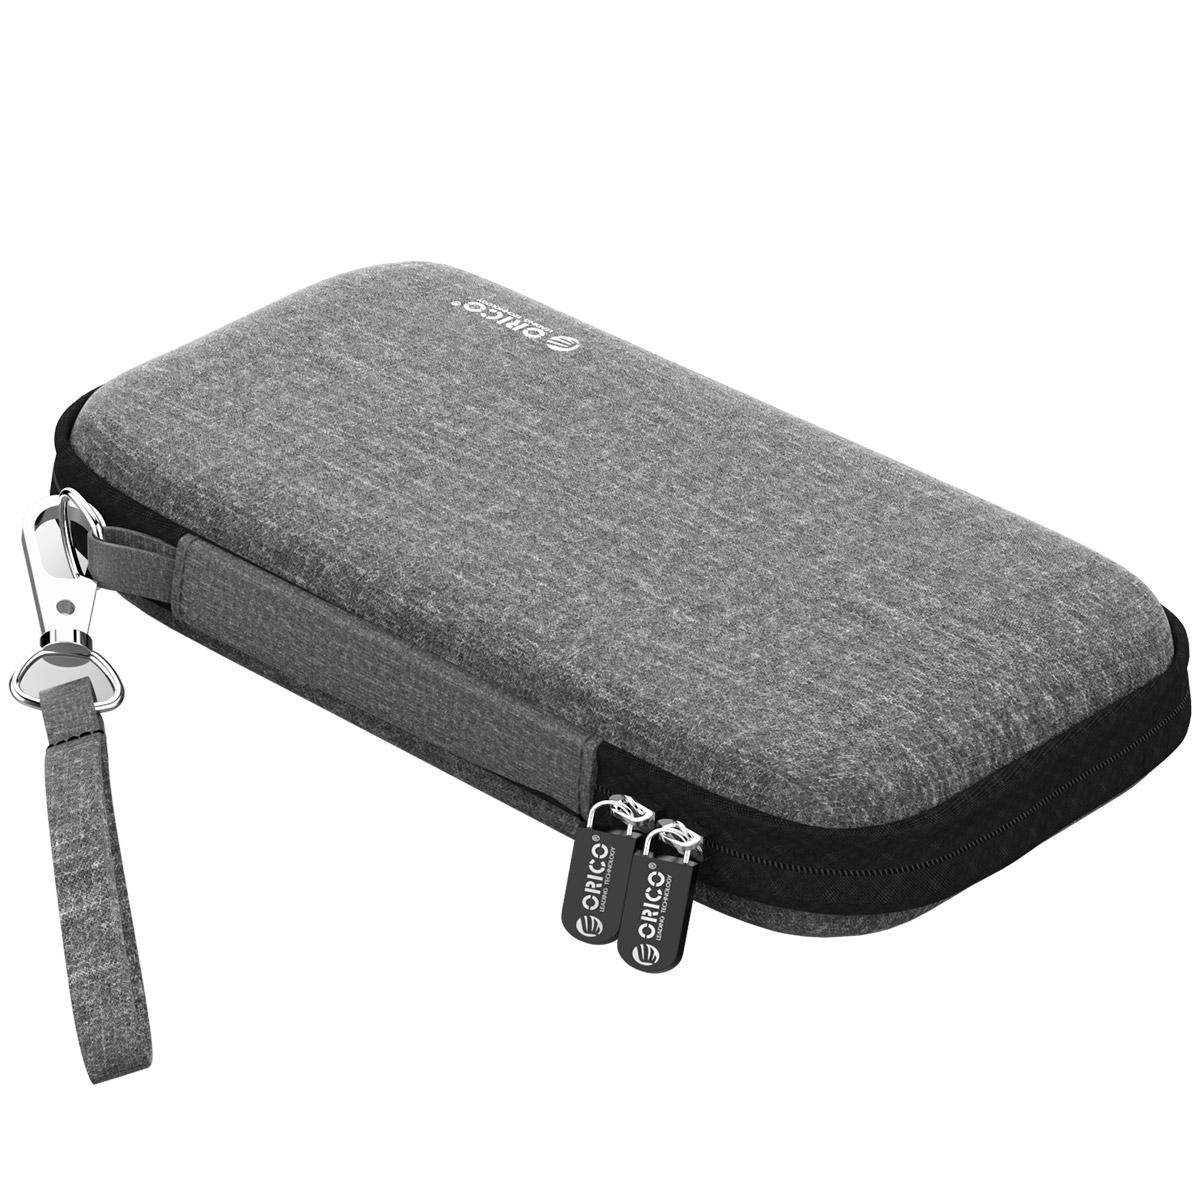 Capa / Case Protetora para HD/SSD 2.5  PH-D2-V1